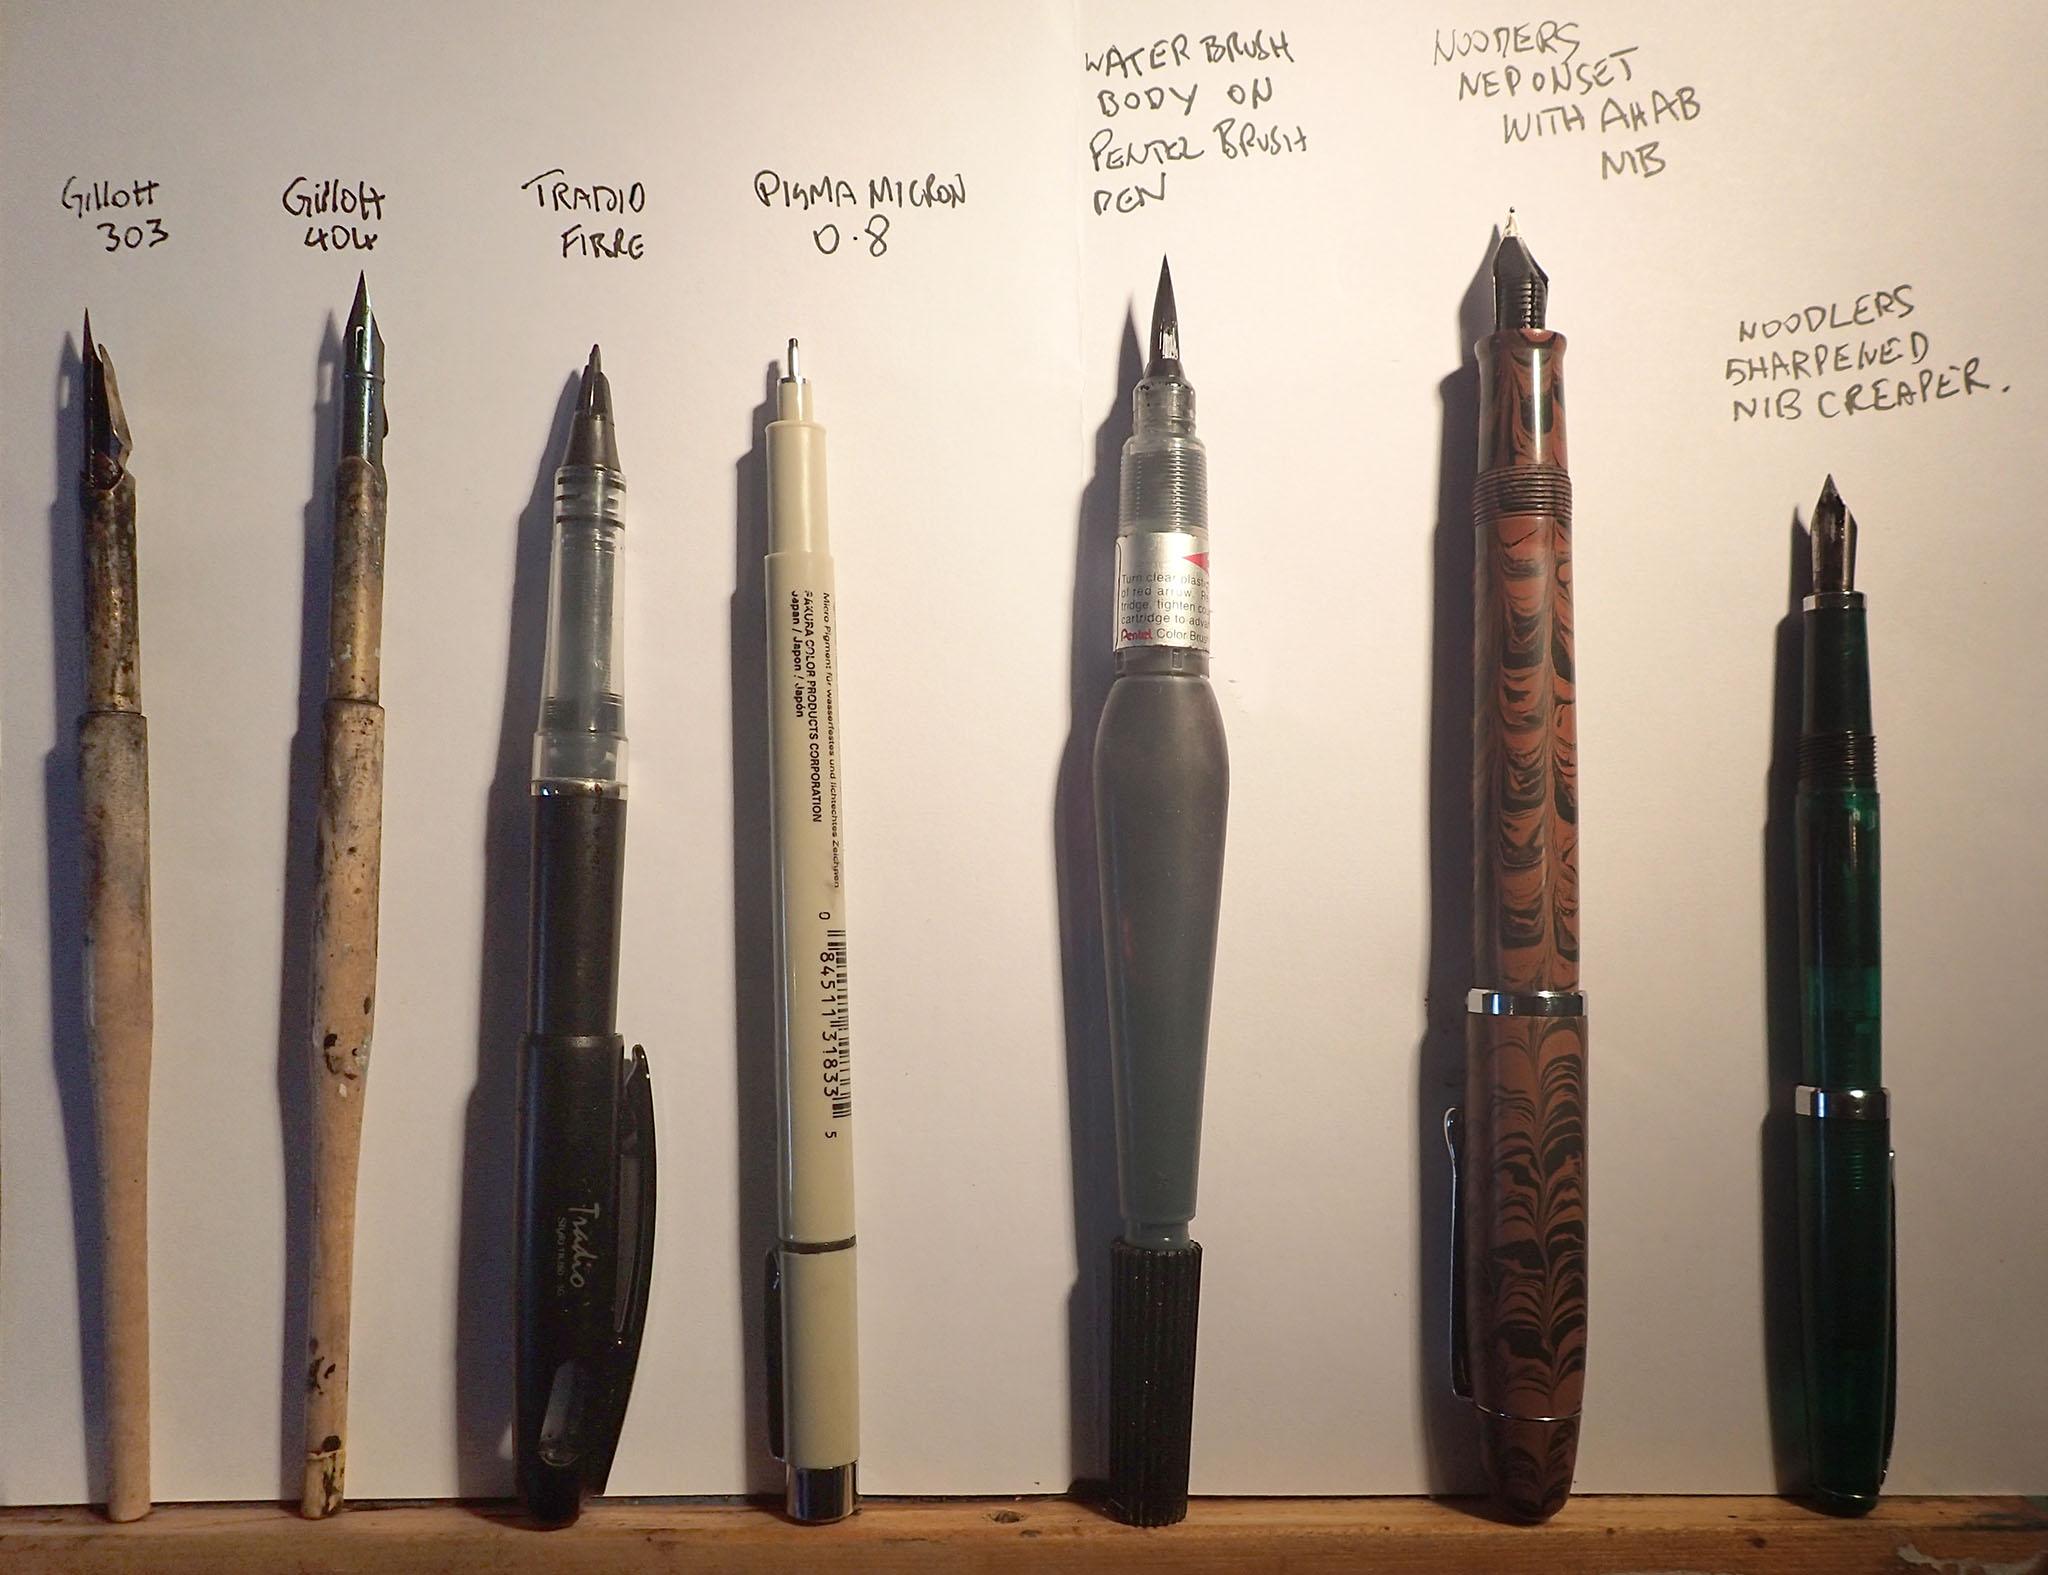 Drawn pen noodler Trade pens the Pen neponsit